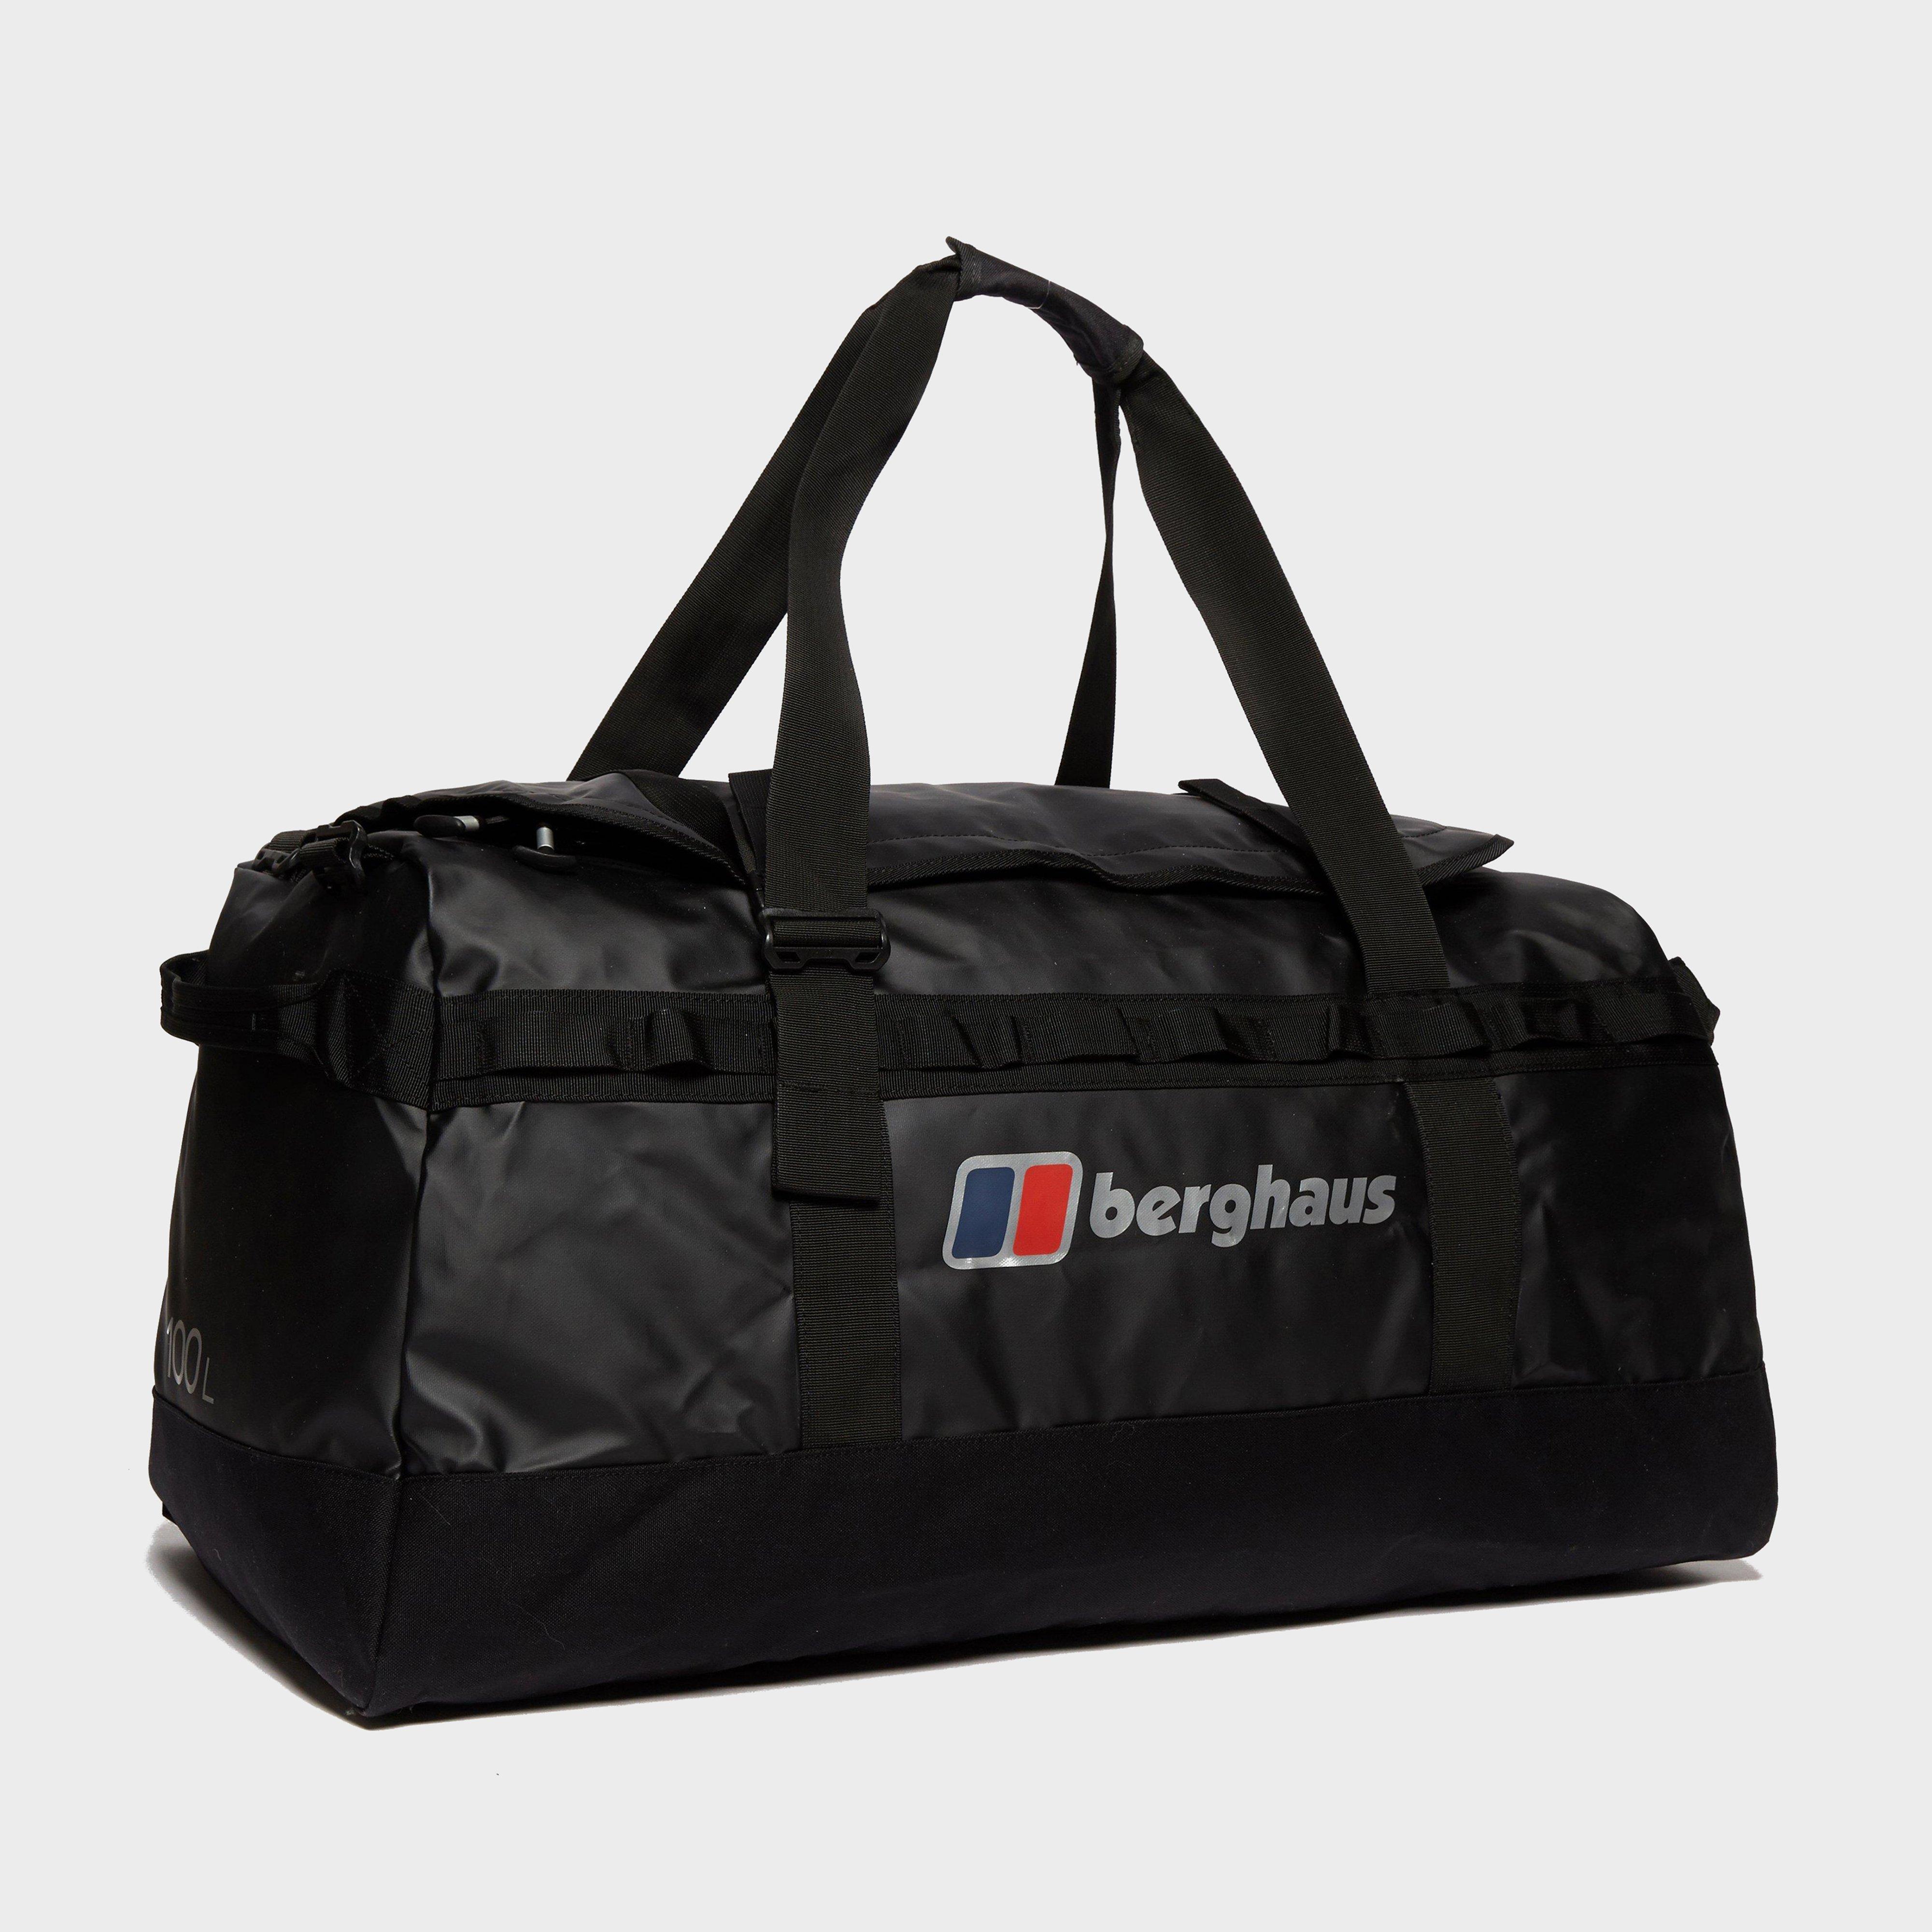 Berghaus Global 100l Holdall - Black  Black